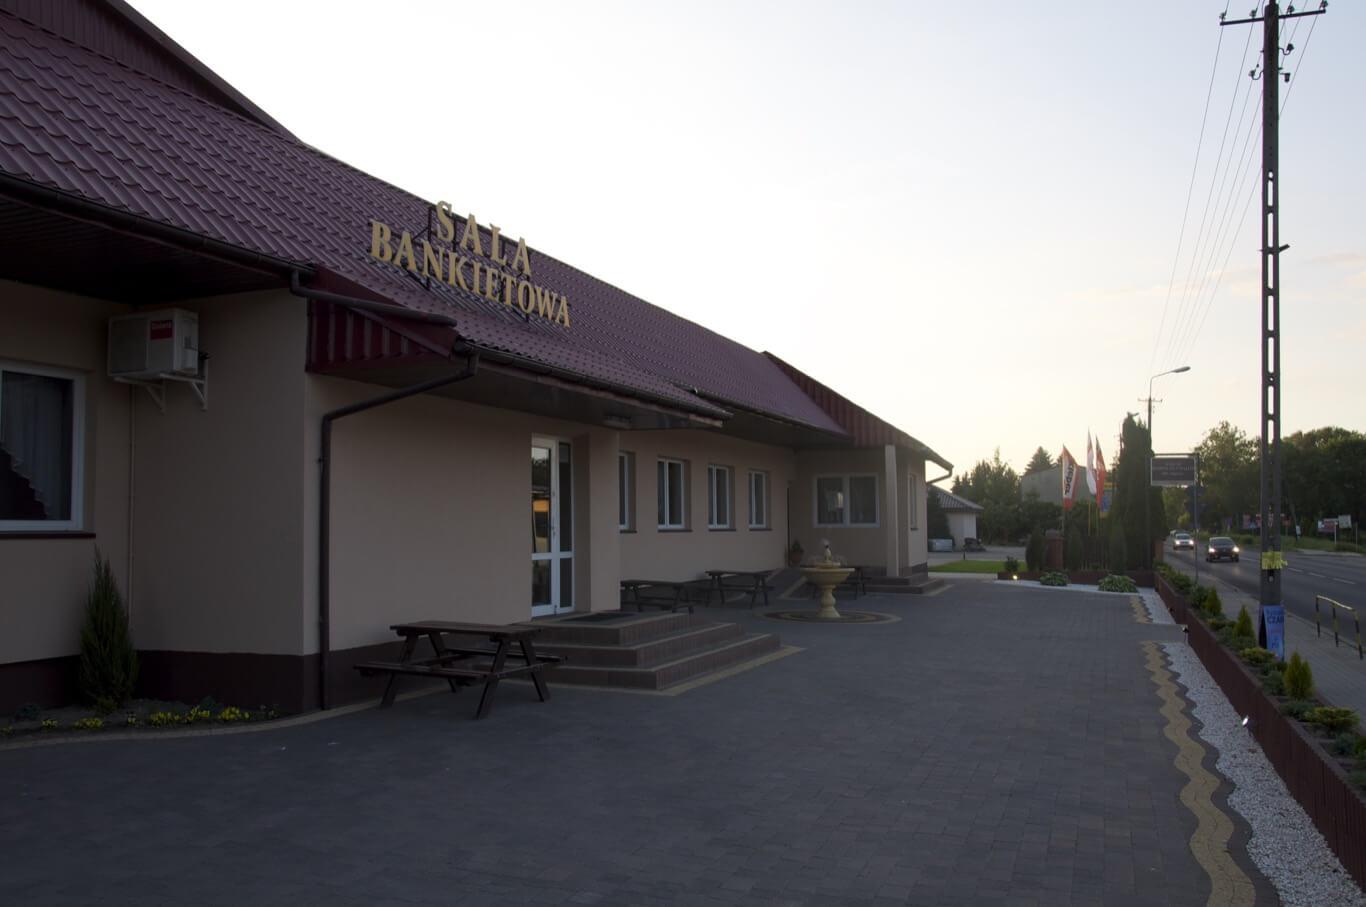 SalaBankietowa 024